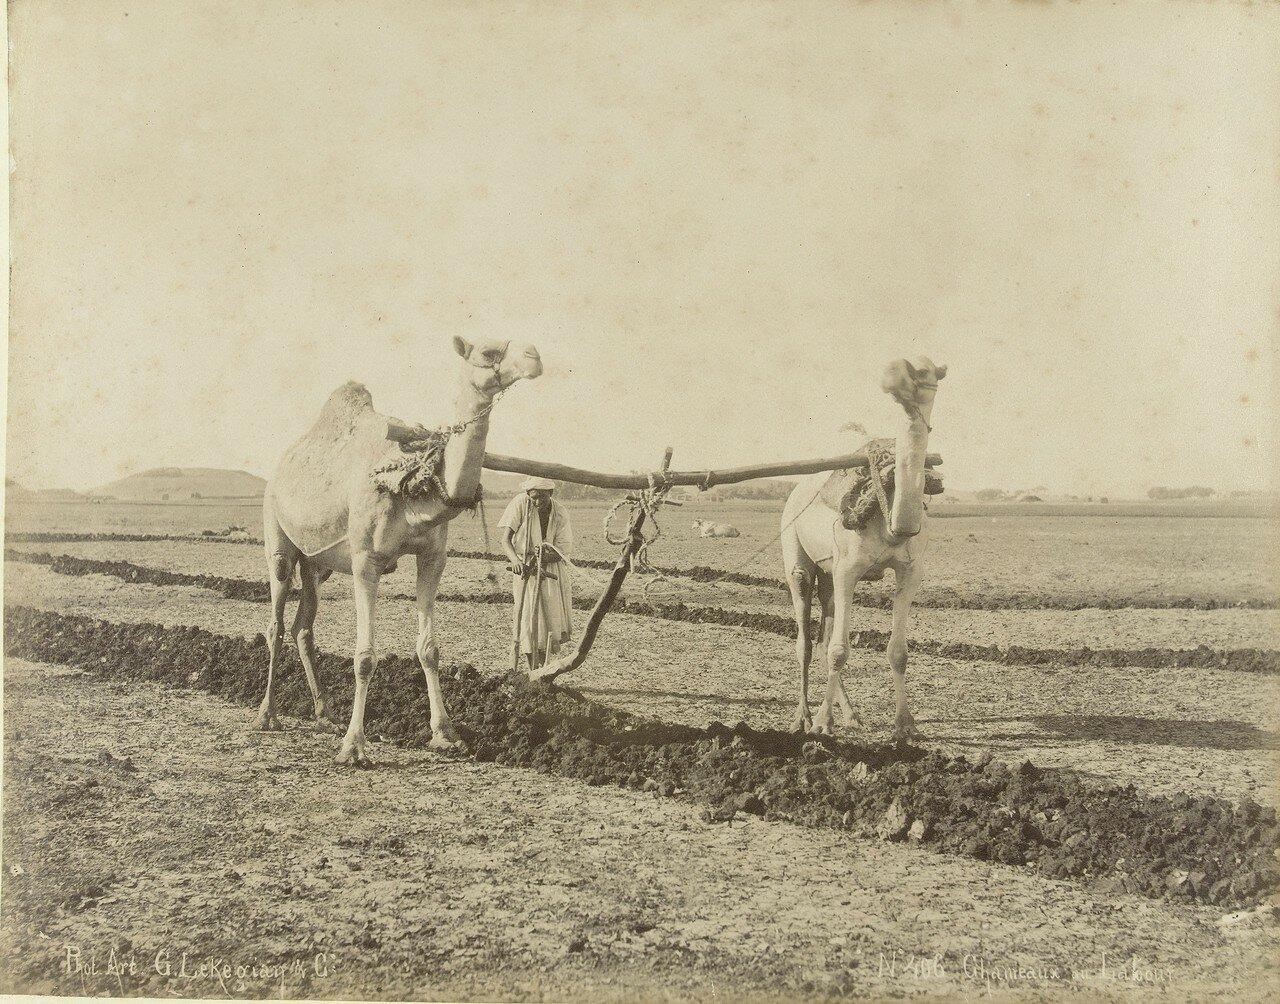 Фелах вспахивает пашню на верблюдах